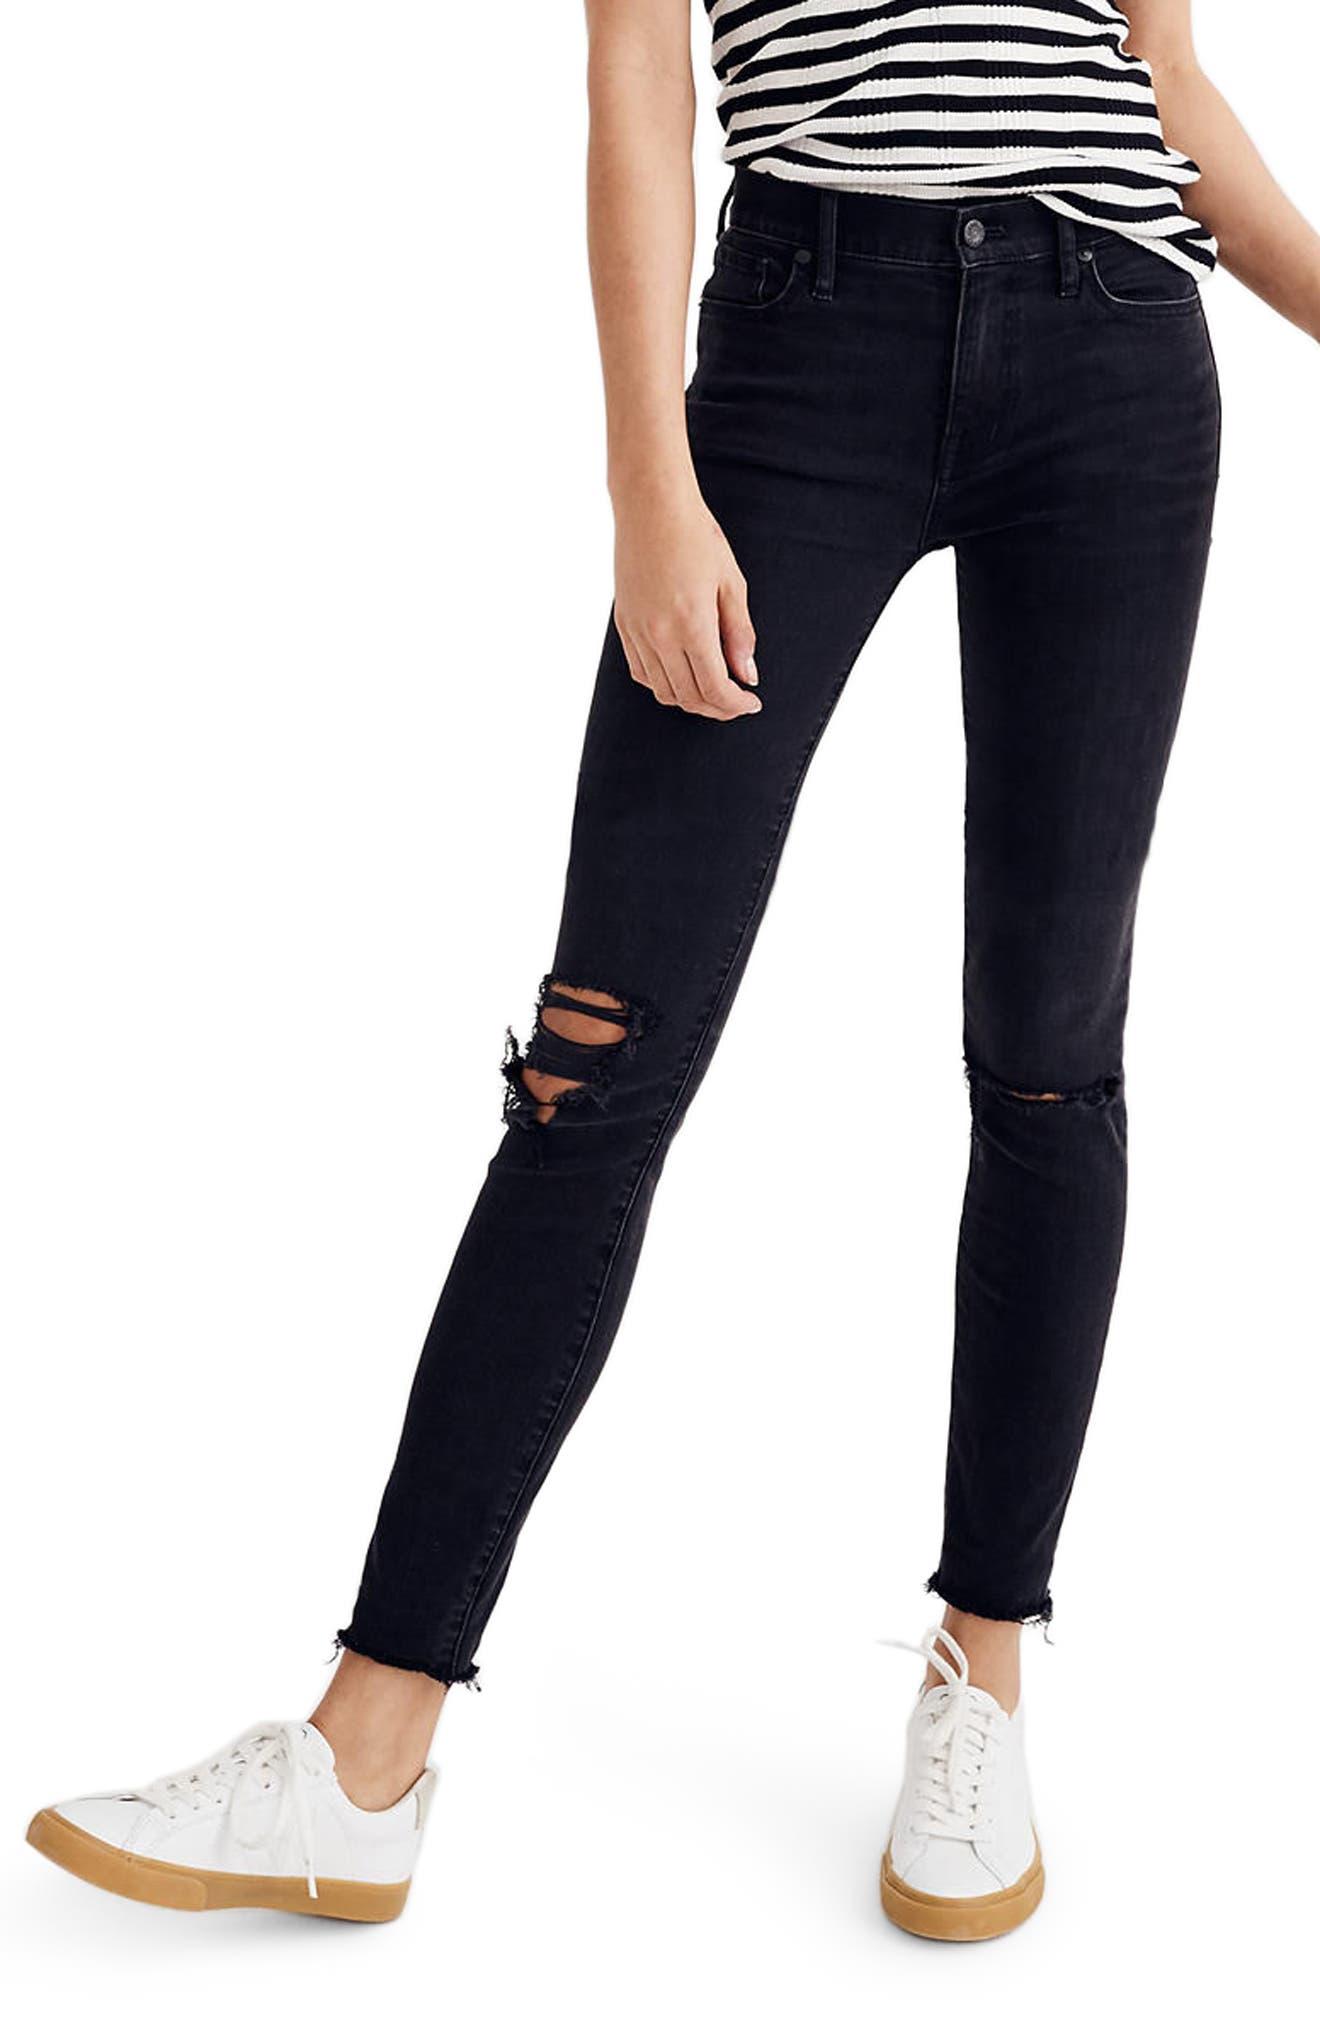 Madewell 9-Inch High Waist Skinny Jeans (Black Sea) (Tall)